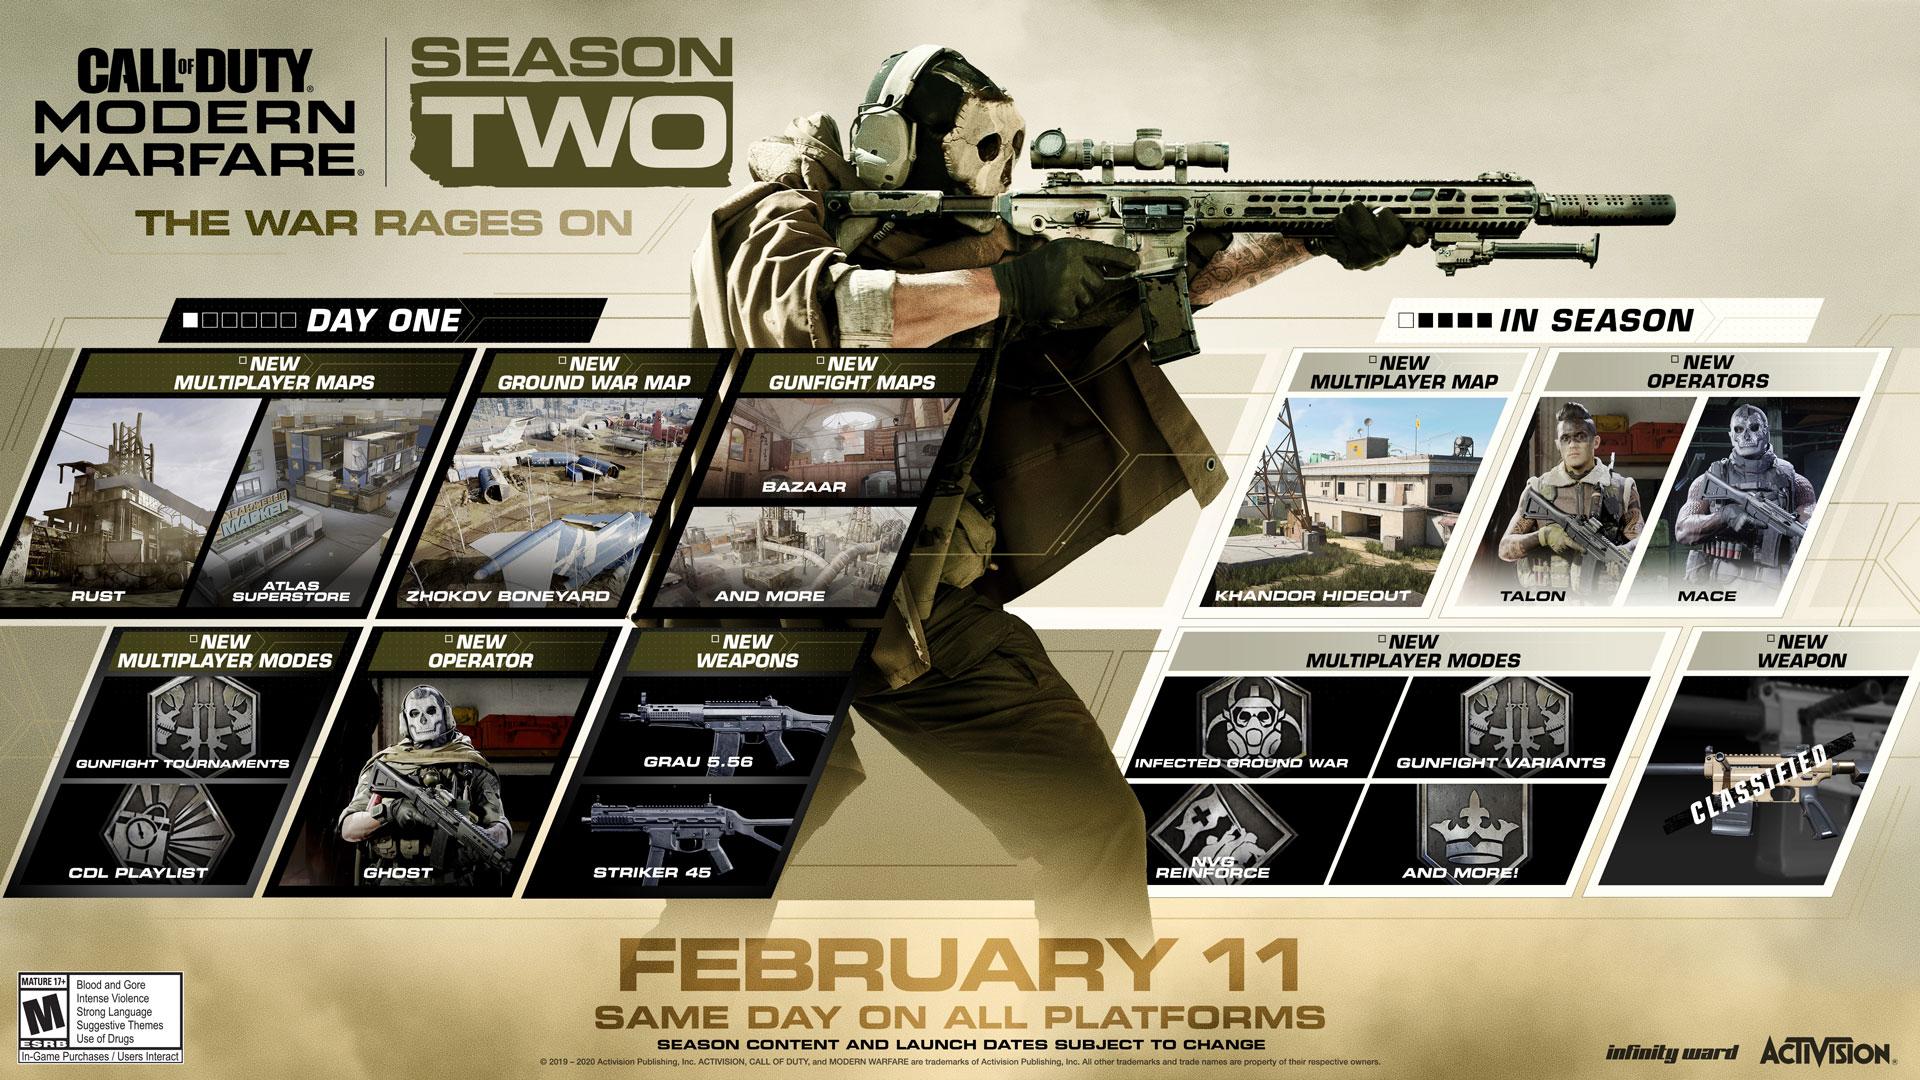 Call of Duty Modern Warfare_Season Two